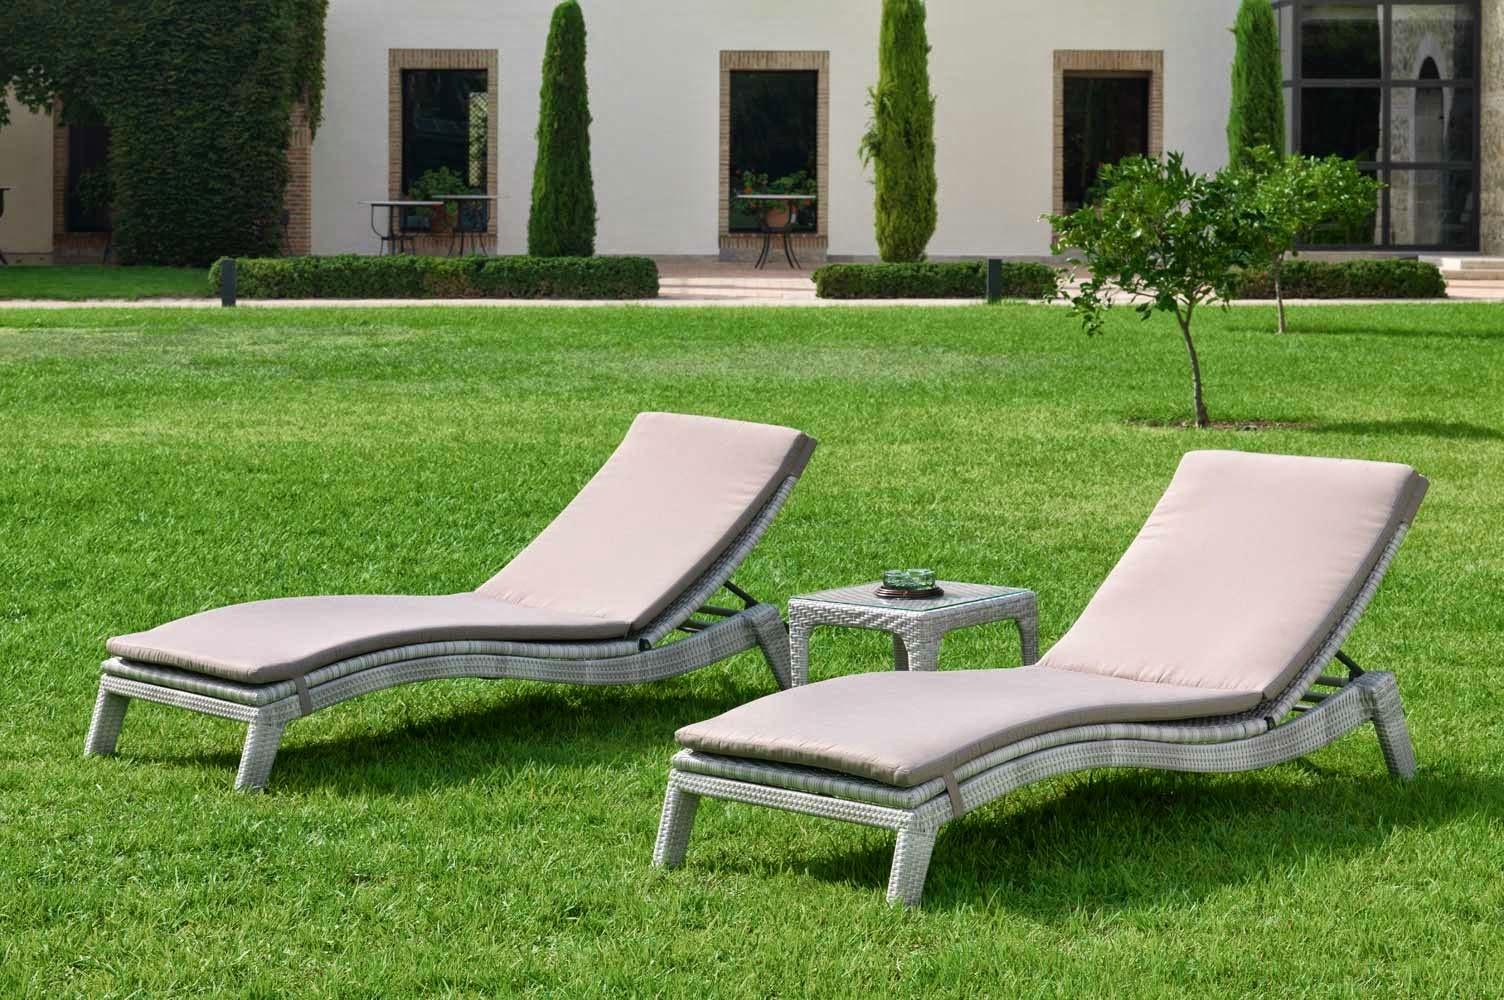 Blog de mbar muebles tumbonas y hamacas - Colchonetas para tumbonas jardin ...